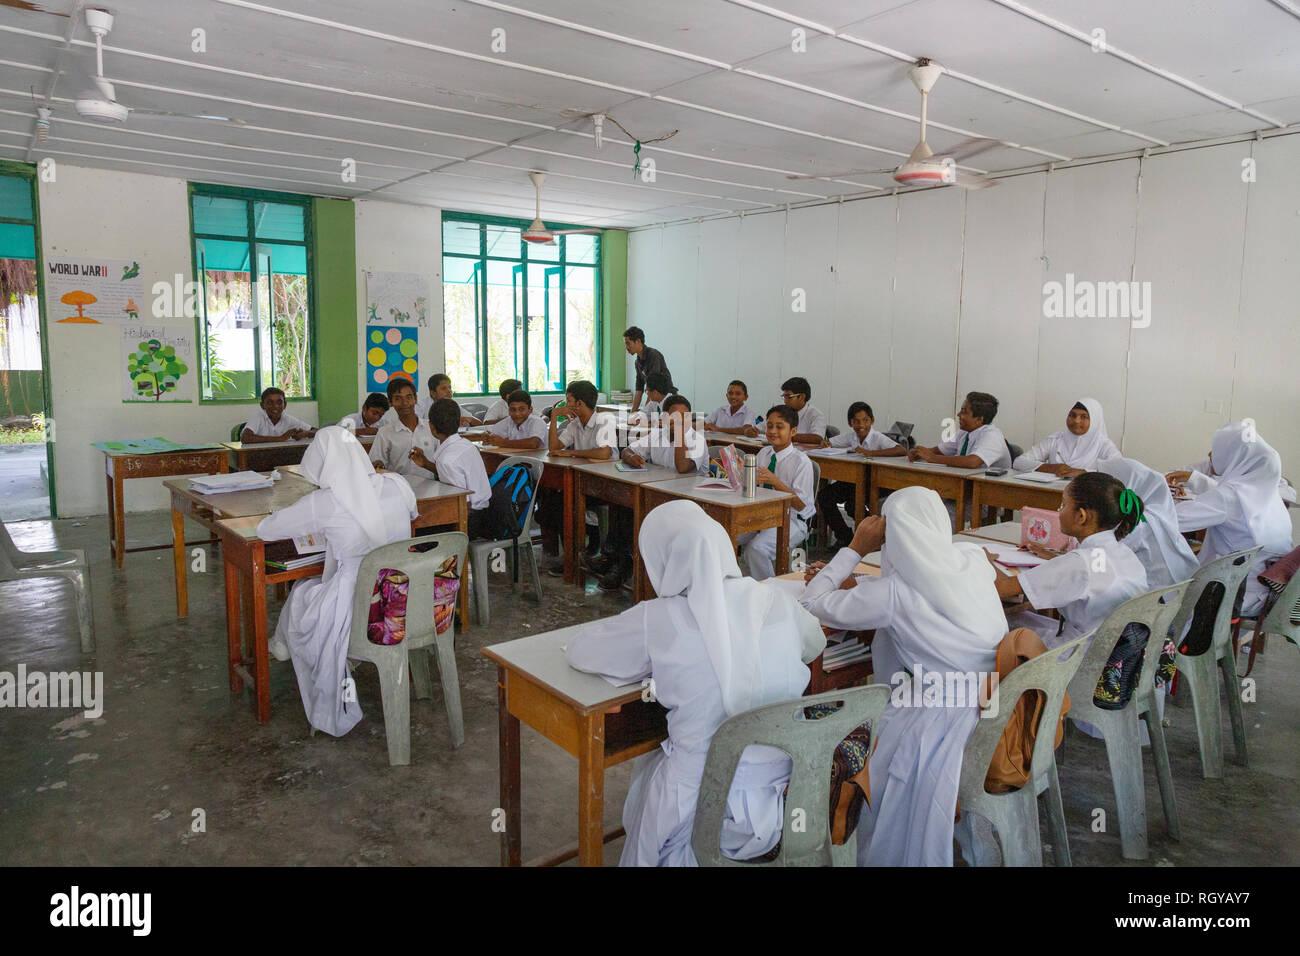 Maldives school - muslim secondary schoolchildren in the classroom, Ukulhas Island, the Maldives, Asia - Stock Image